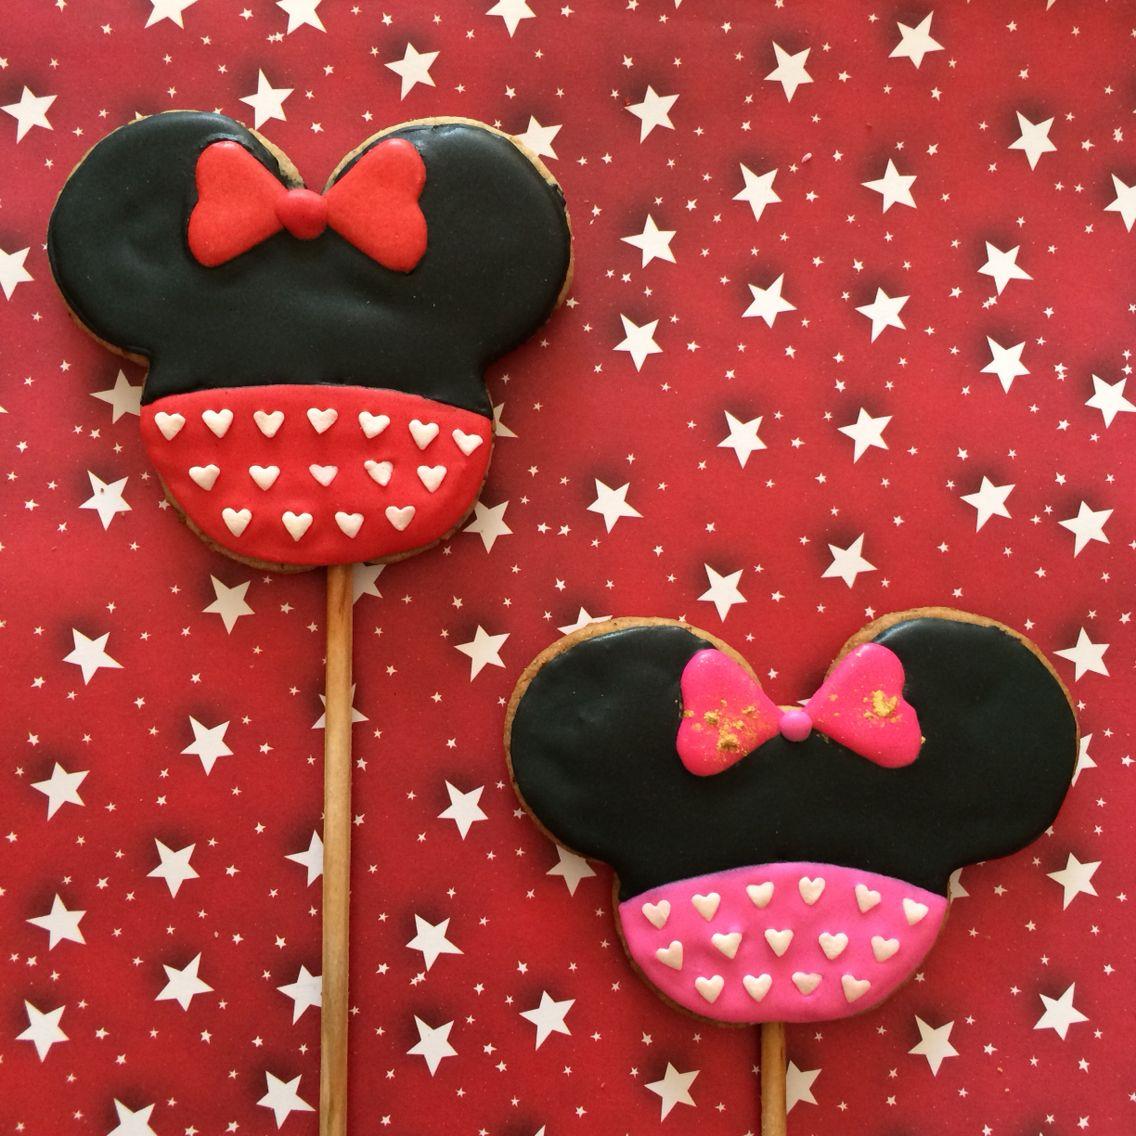 Love Minnie cookies cookies saint valentine's  icing glass 14 february Galletas de minnie de san valentin, 14 de febrero